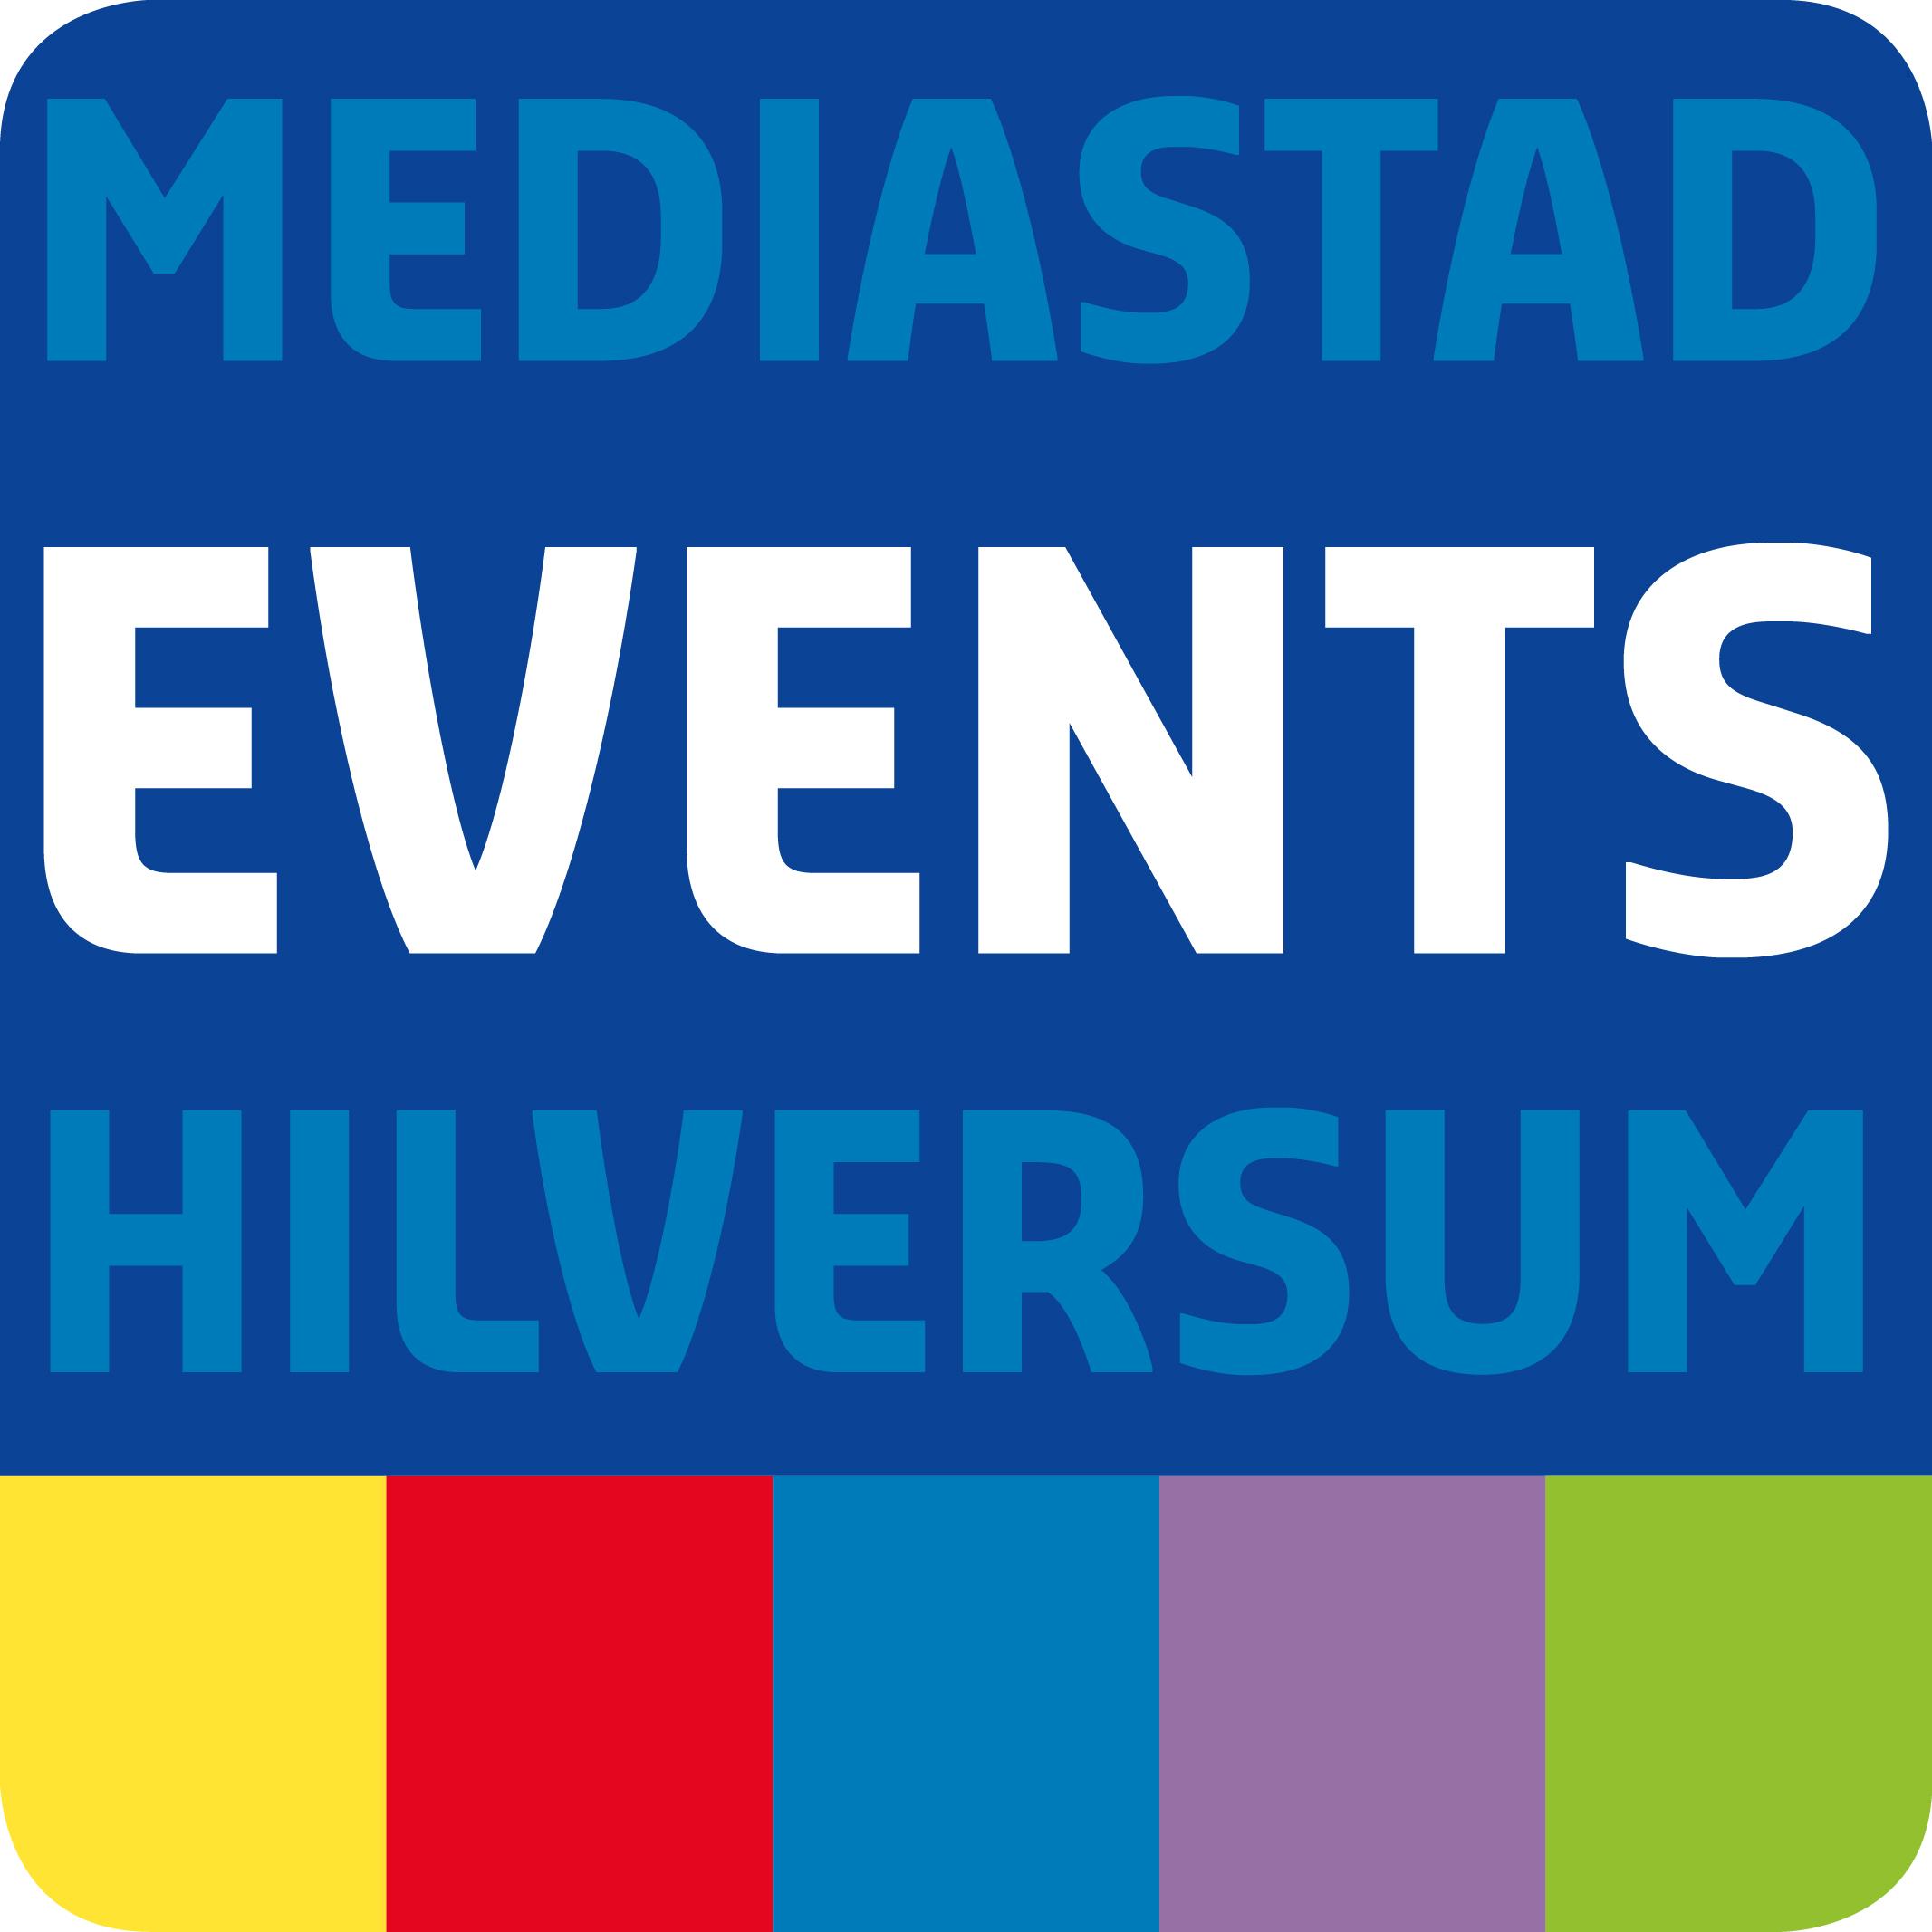 Mediastad Events Hilversum